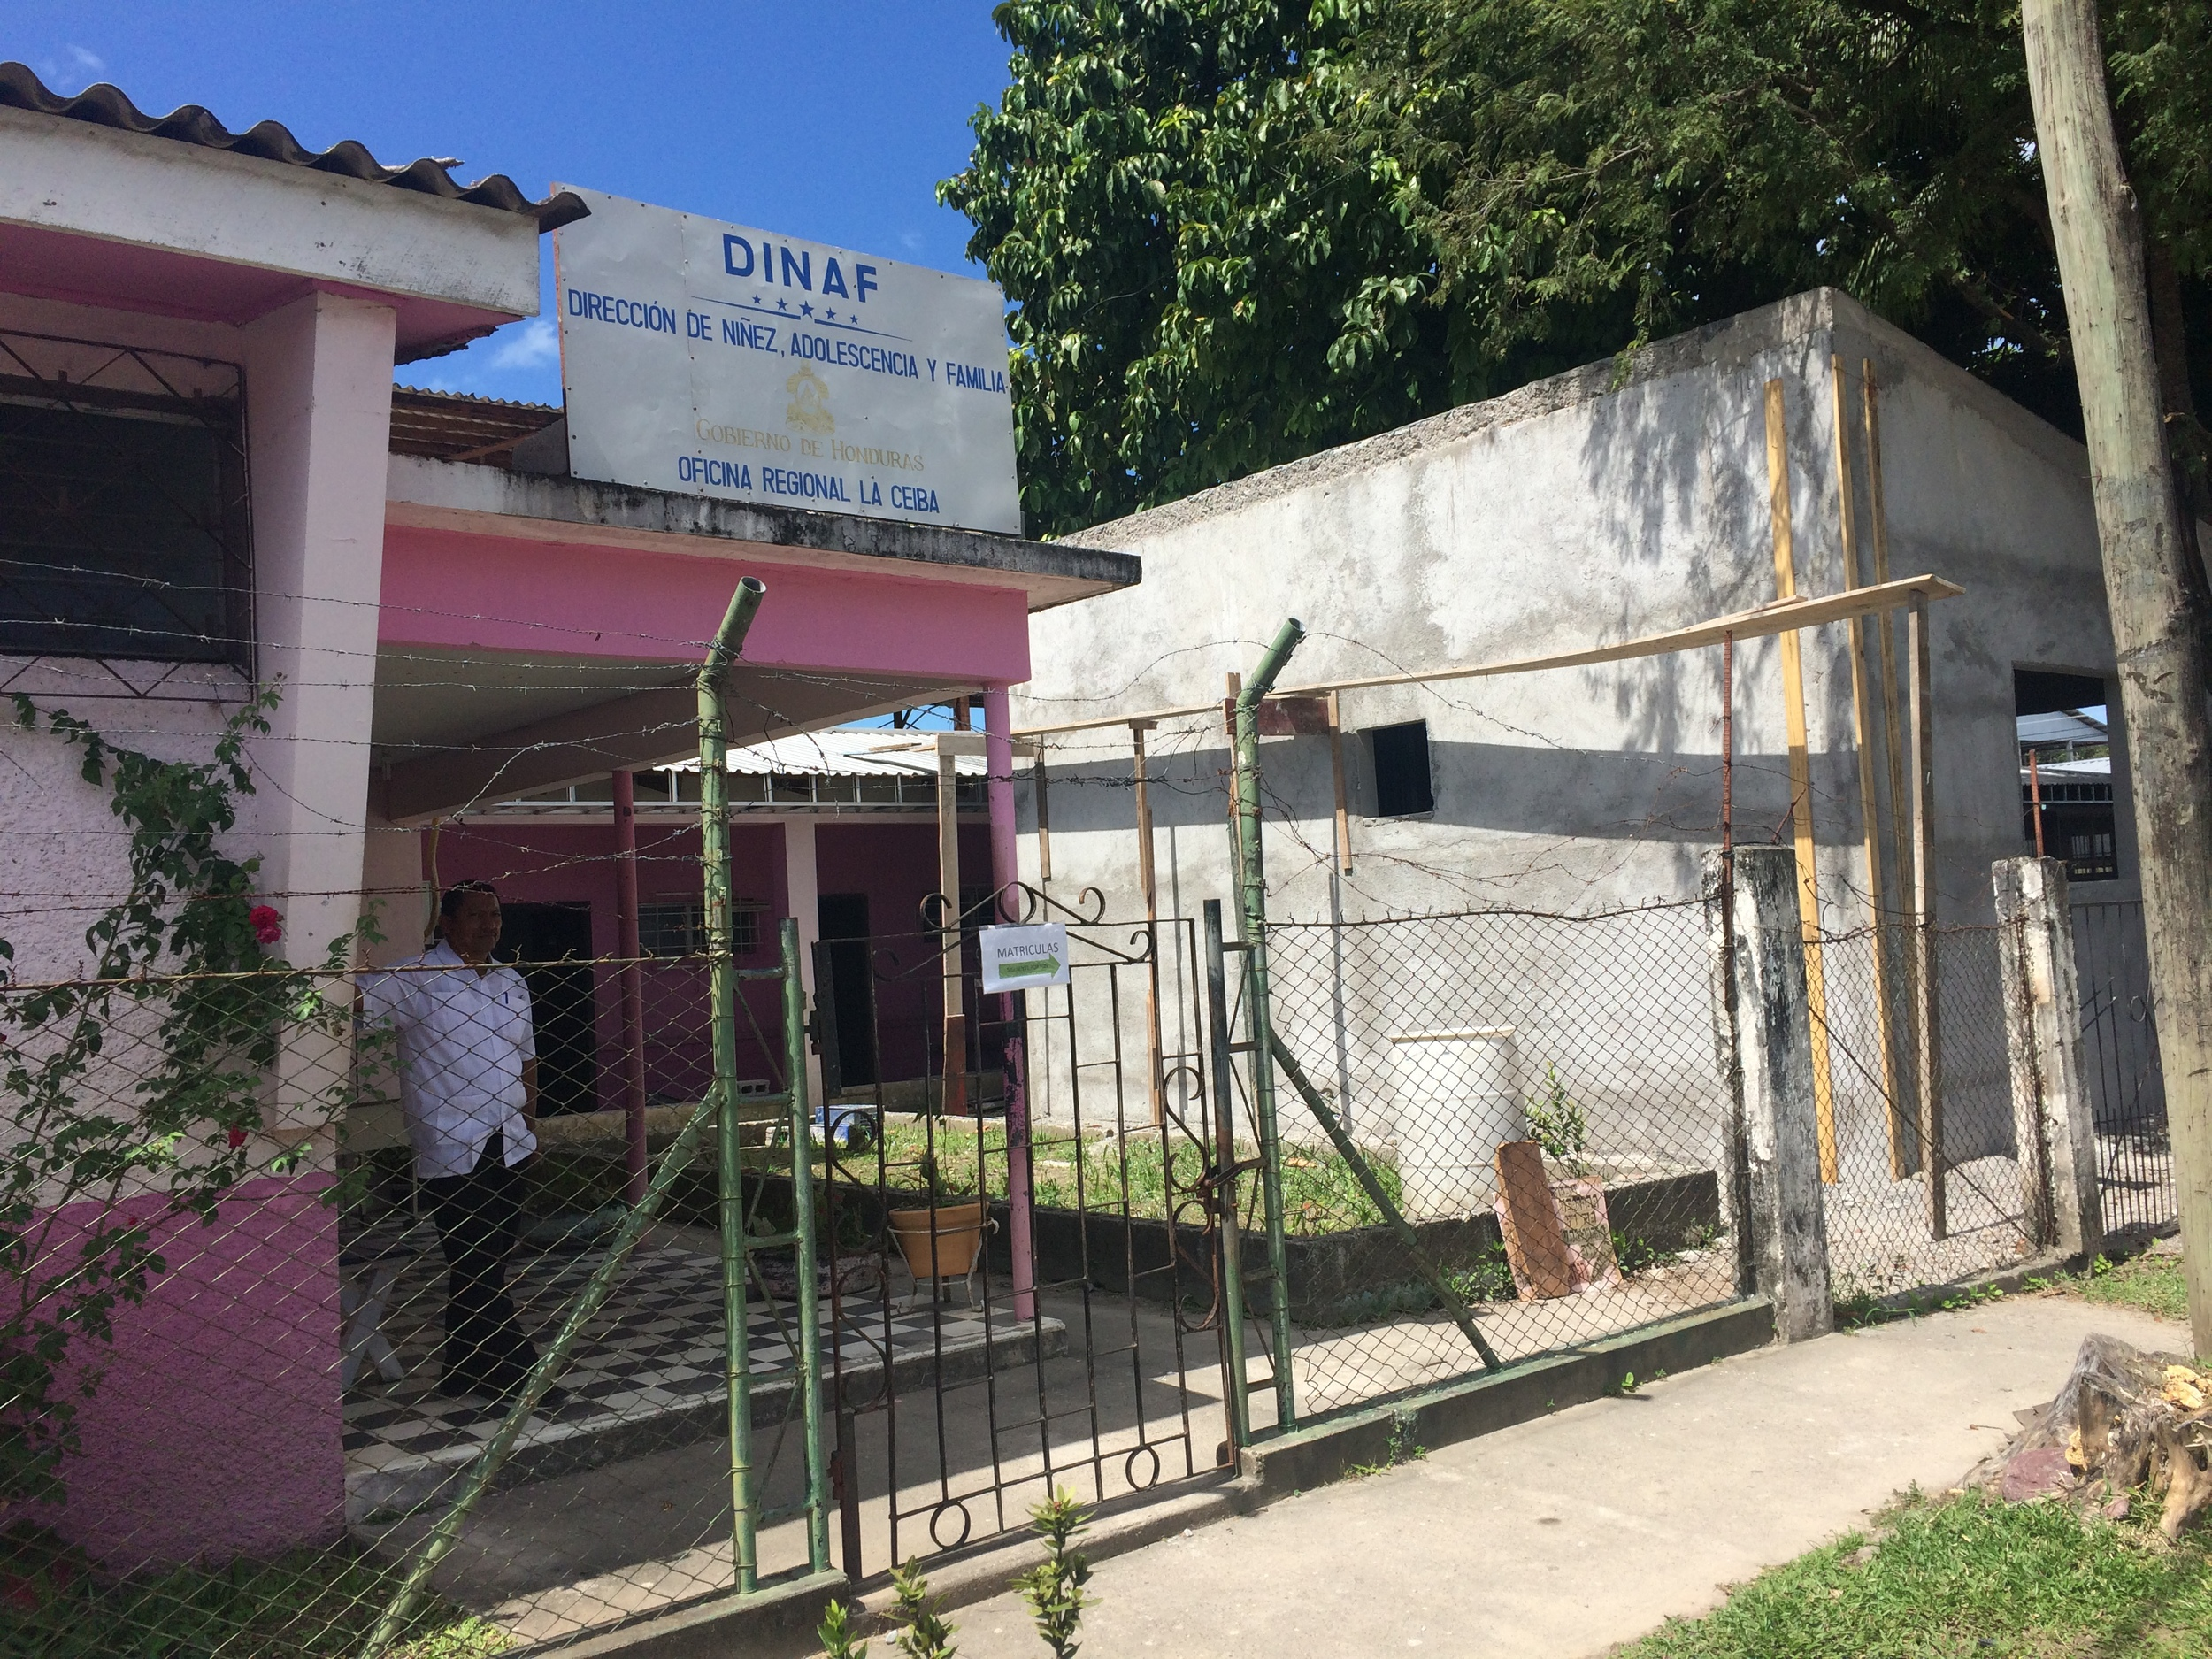 Dinaf Visit La Ceiba Honduras Main Entrance